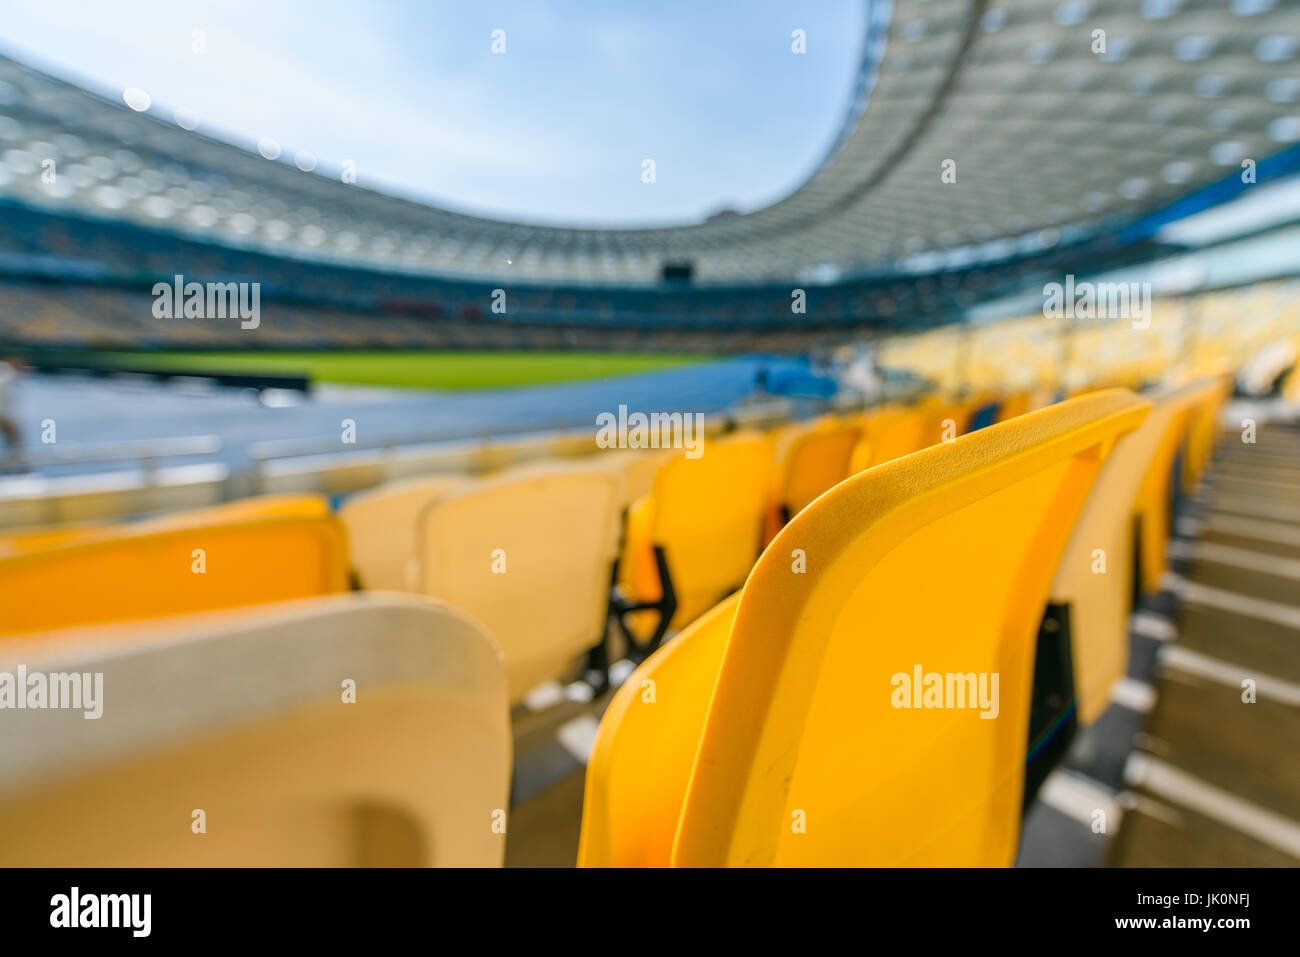 selektiven Fokus des gelben Stadionsitze Fußballstadion Stockbild